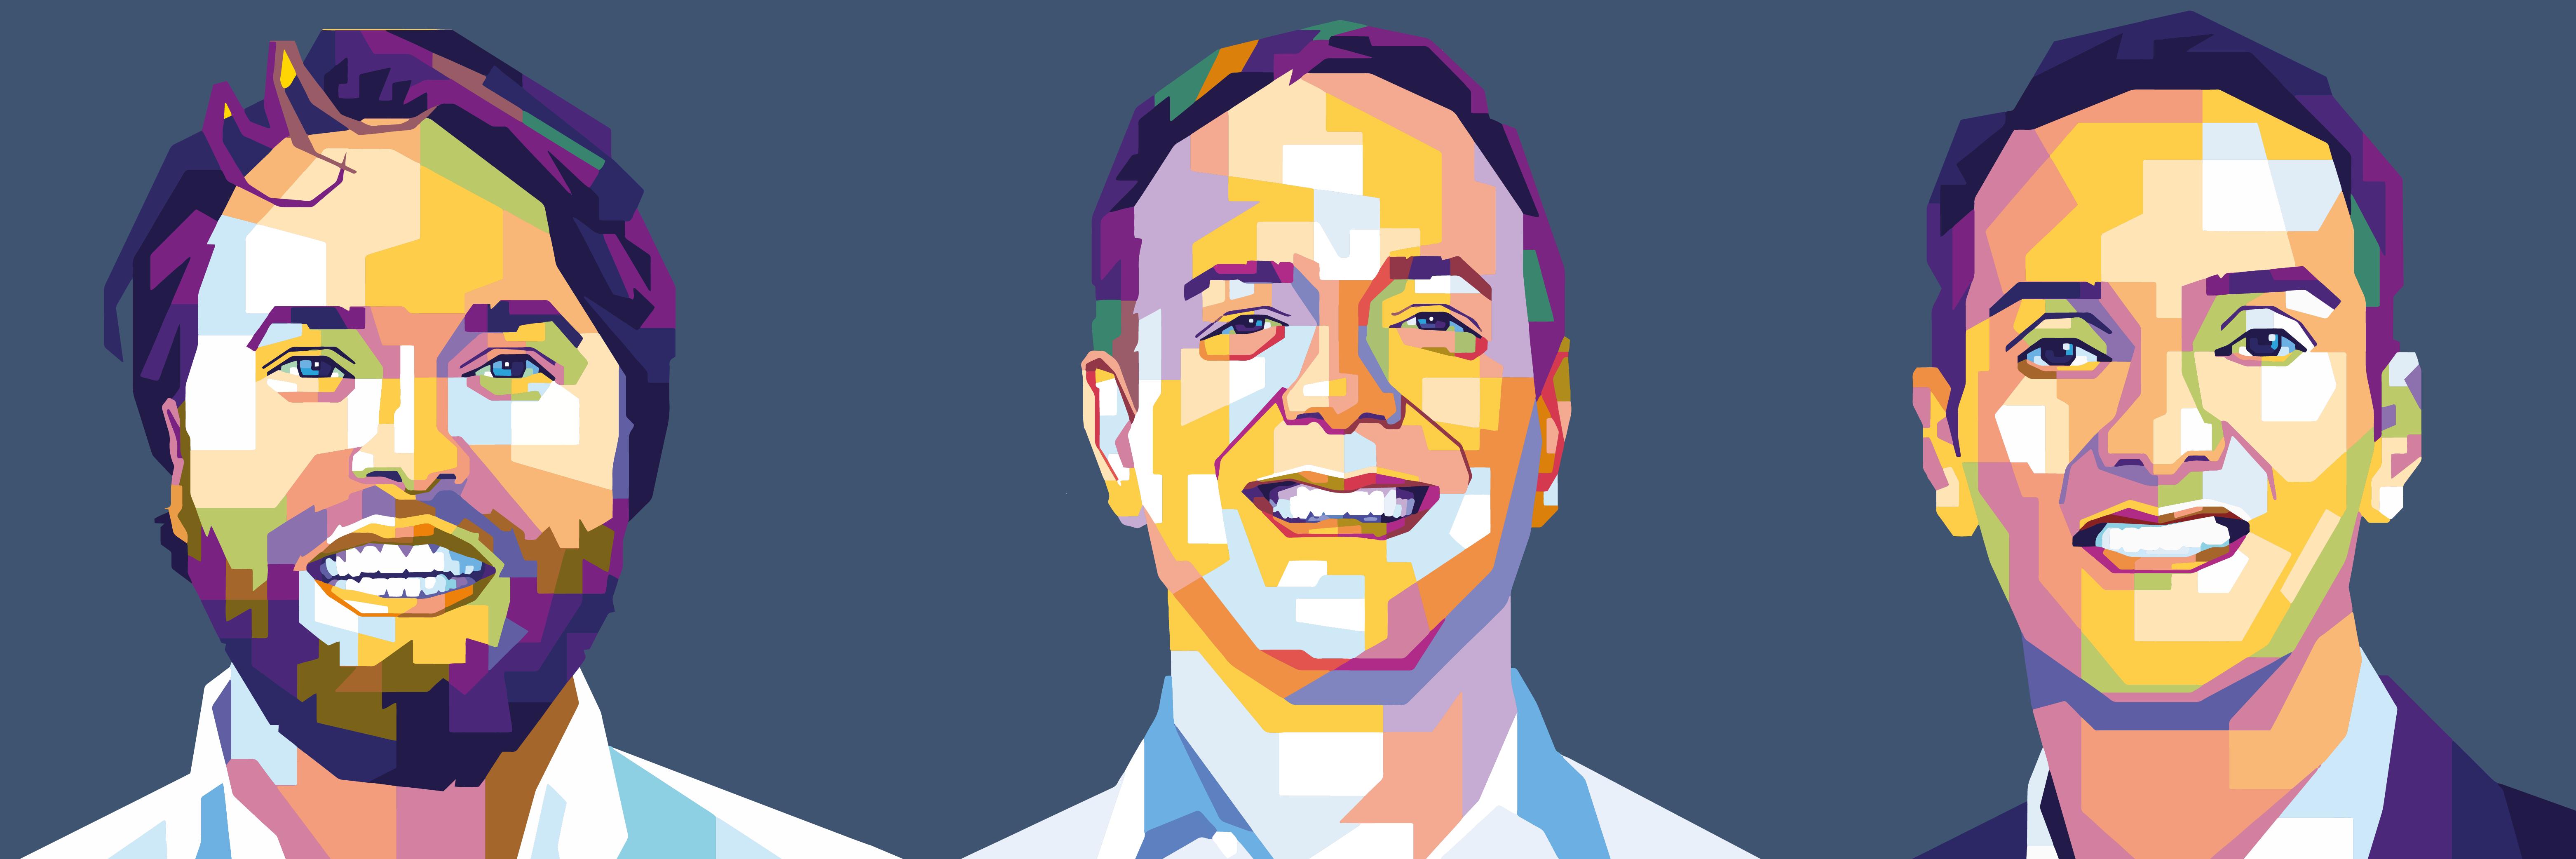 AdvisorEngine's Schwab Integration: A conversation with our leadership